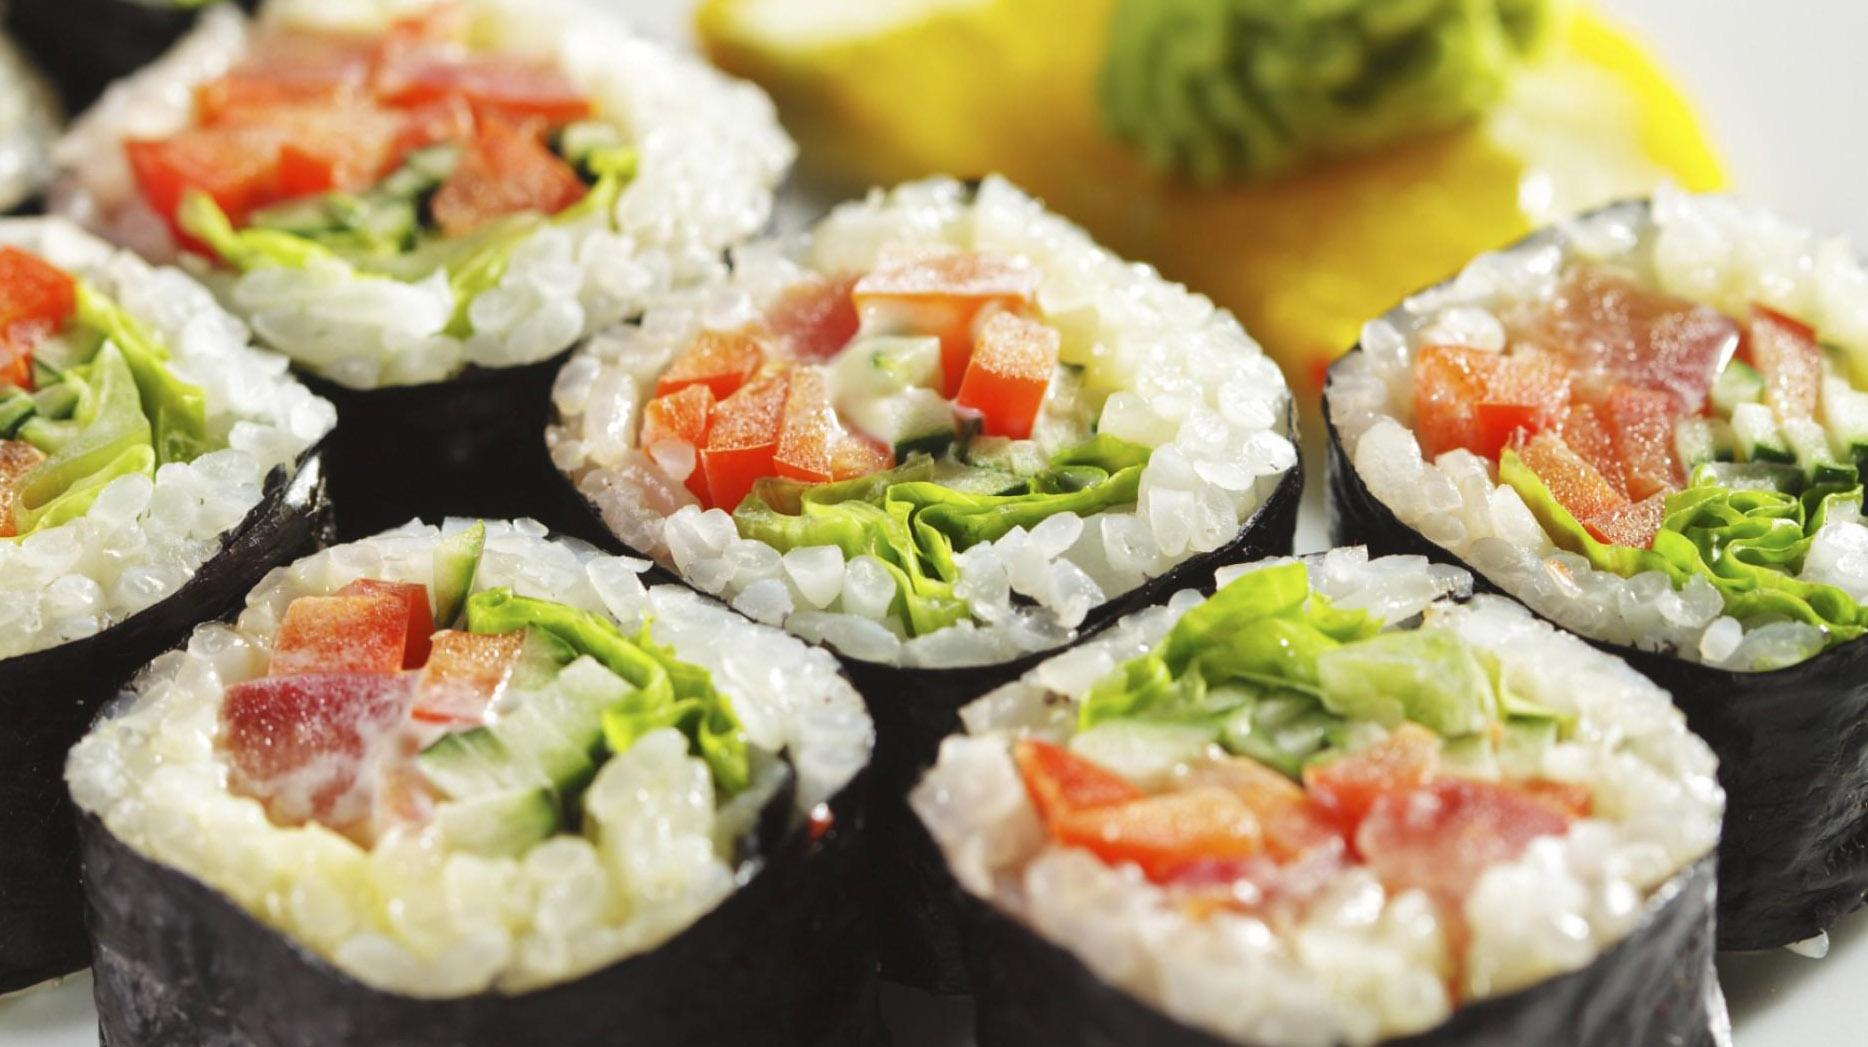 Migliori all you can eat torino aperti a pranzo for I migliori piani di casa aperti